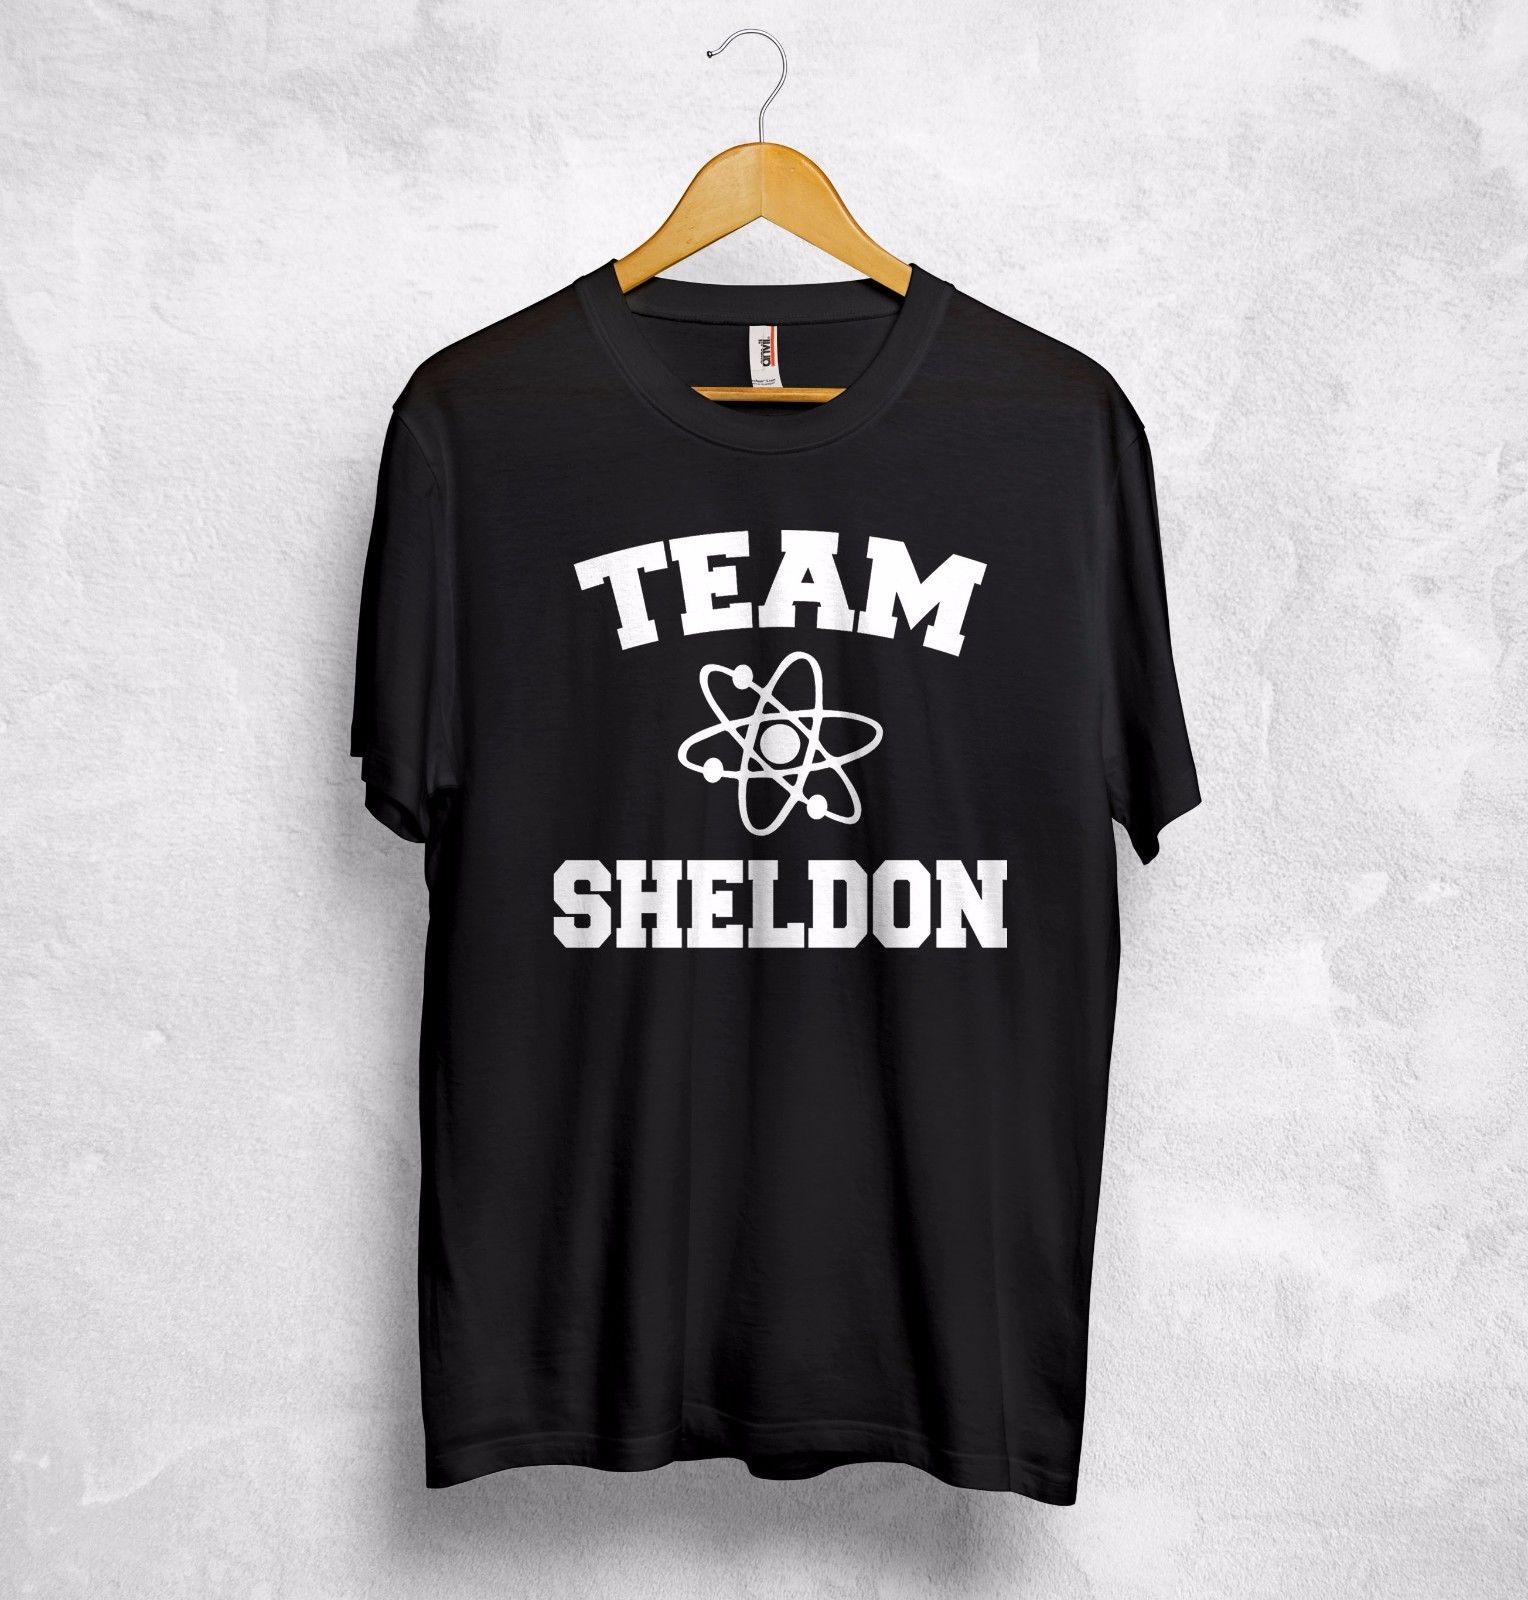 Team Sheldon Cooper T Shirt Top Nerd Geek The Big Bang Theory Penny Leonard Gift Free shipping Harajuku Tops t shirt Fashion